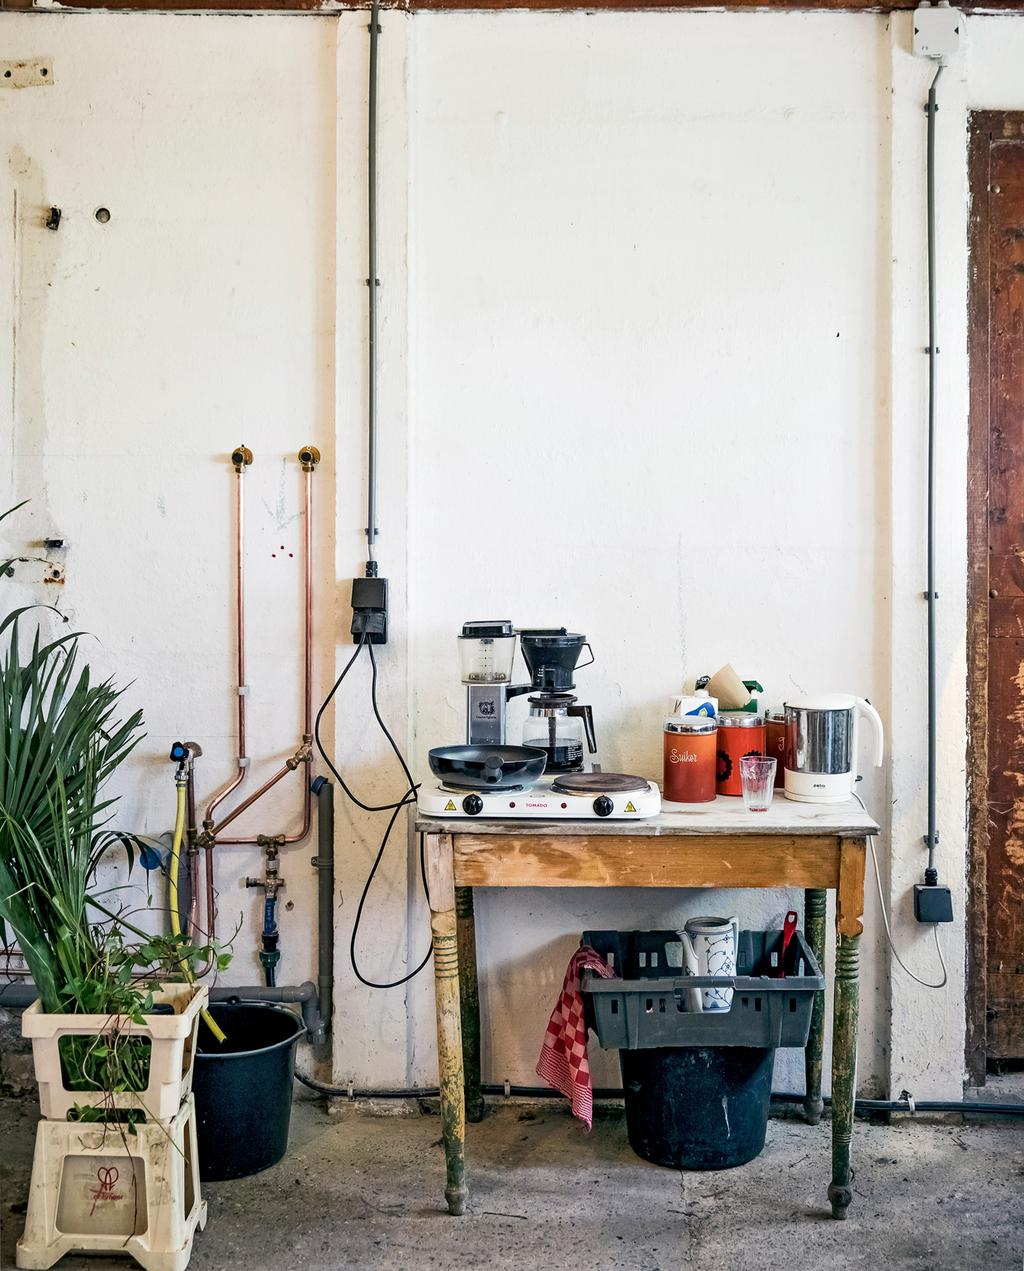 vtwonen 8-2019 | Ambacht Mariette & Denise zelfgekweekte biologische bloemen | binnen werkplek